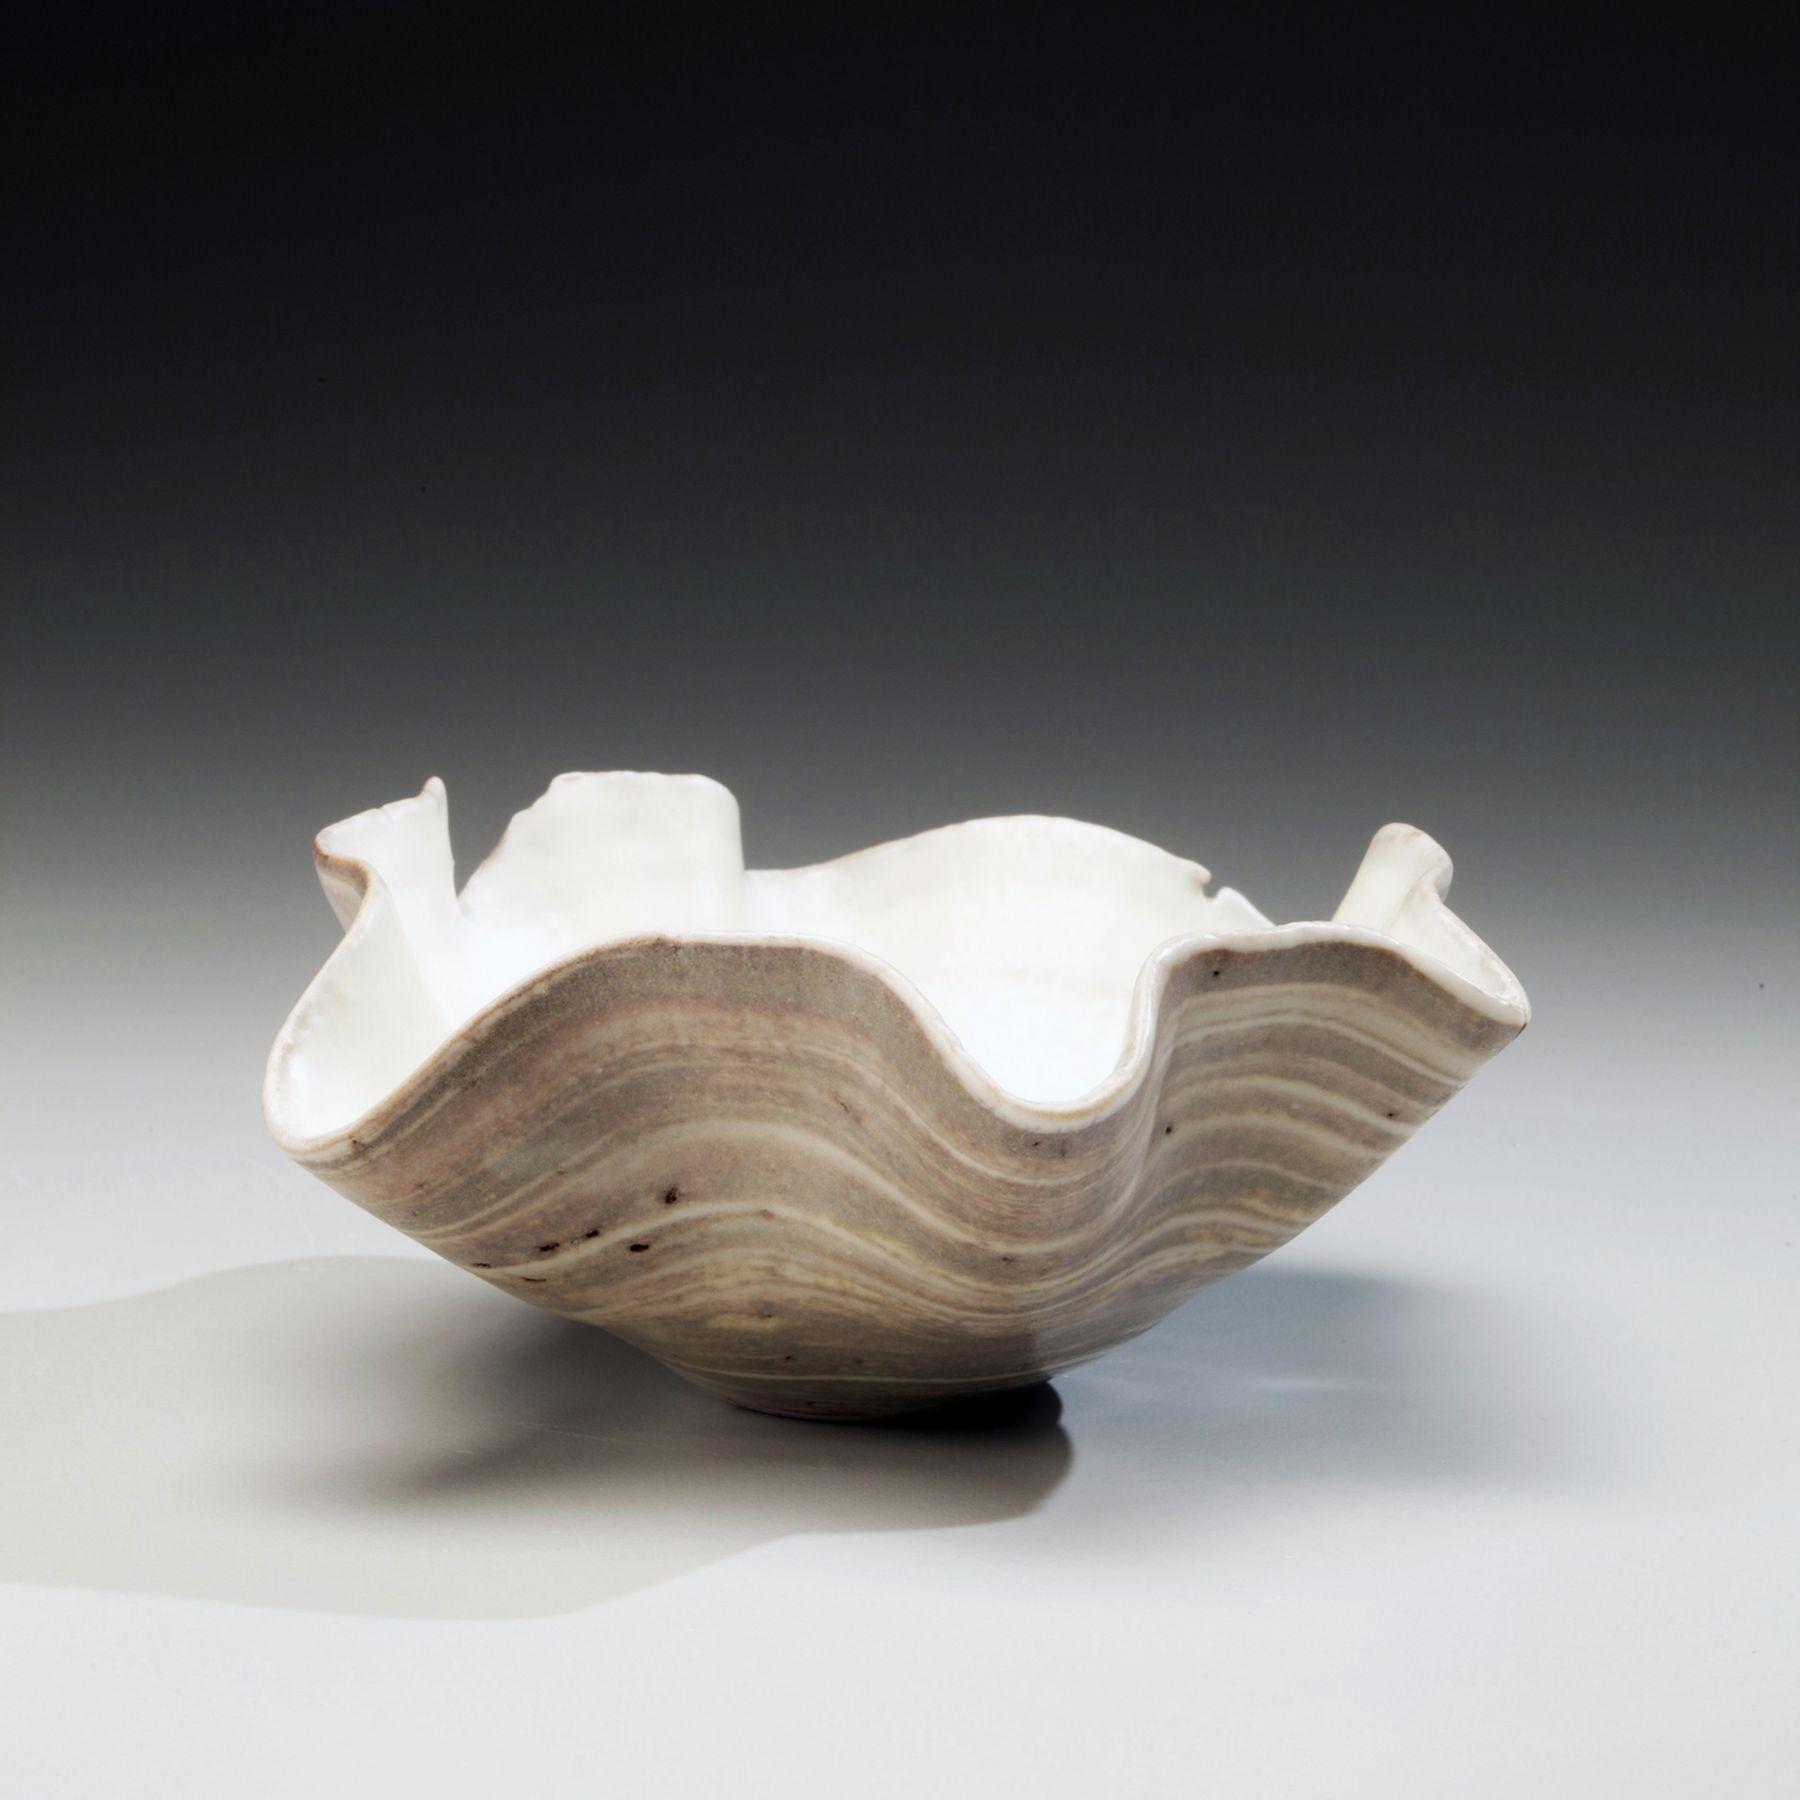 Ito, Hidehito, Ito Hidehito, nerikomi, marbleized, porcelain, marbleized porcelain, Japanese, ceramics, 2011, contemporary, Japanese ceramics, contemporary ceramics, bowl